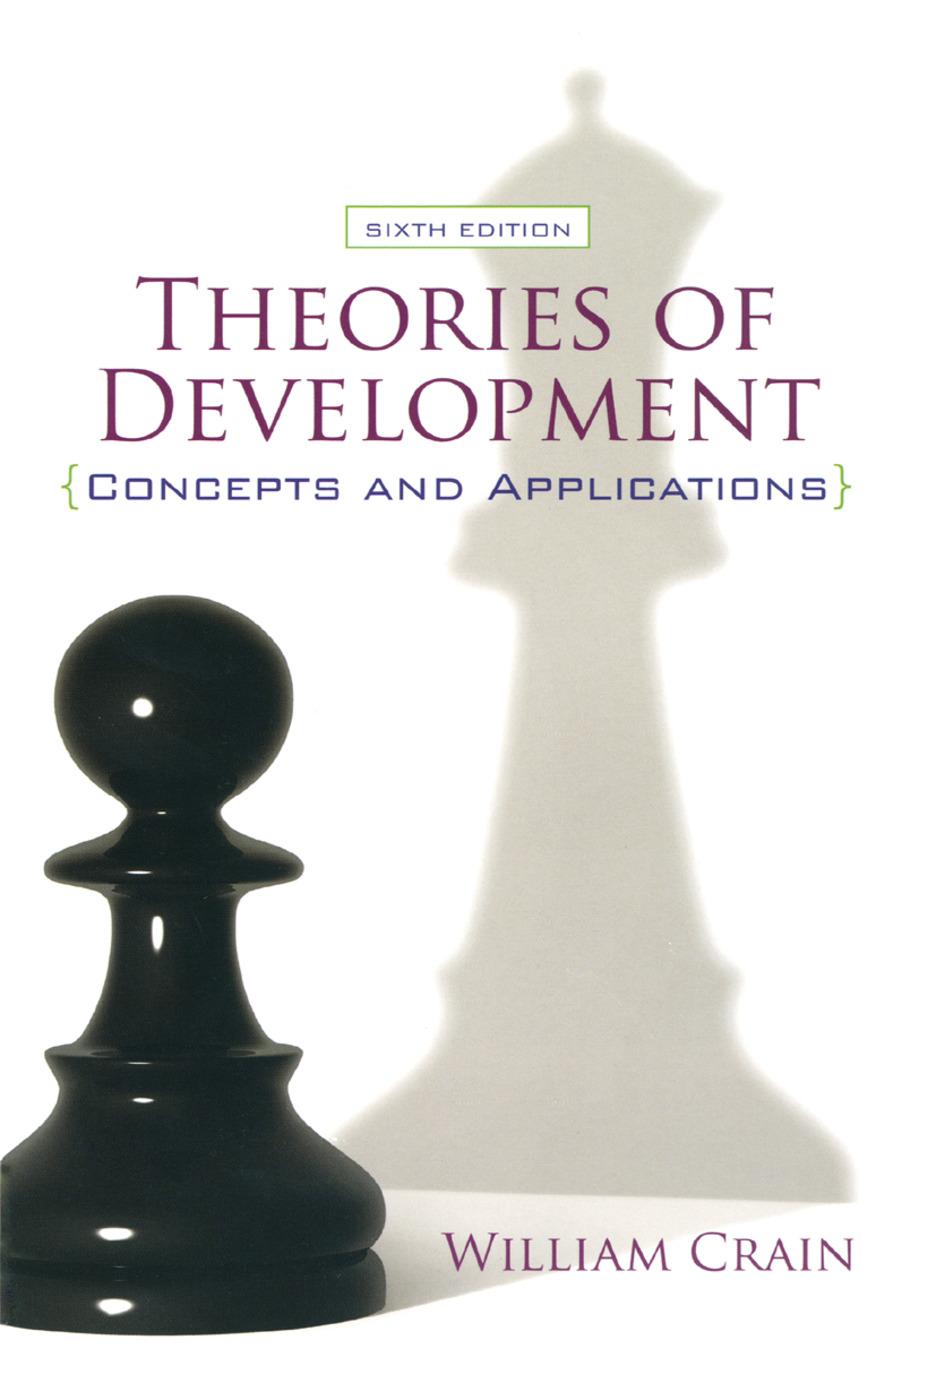 Vygotsky's Social-Historical Theory of Cognitive Development